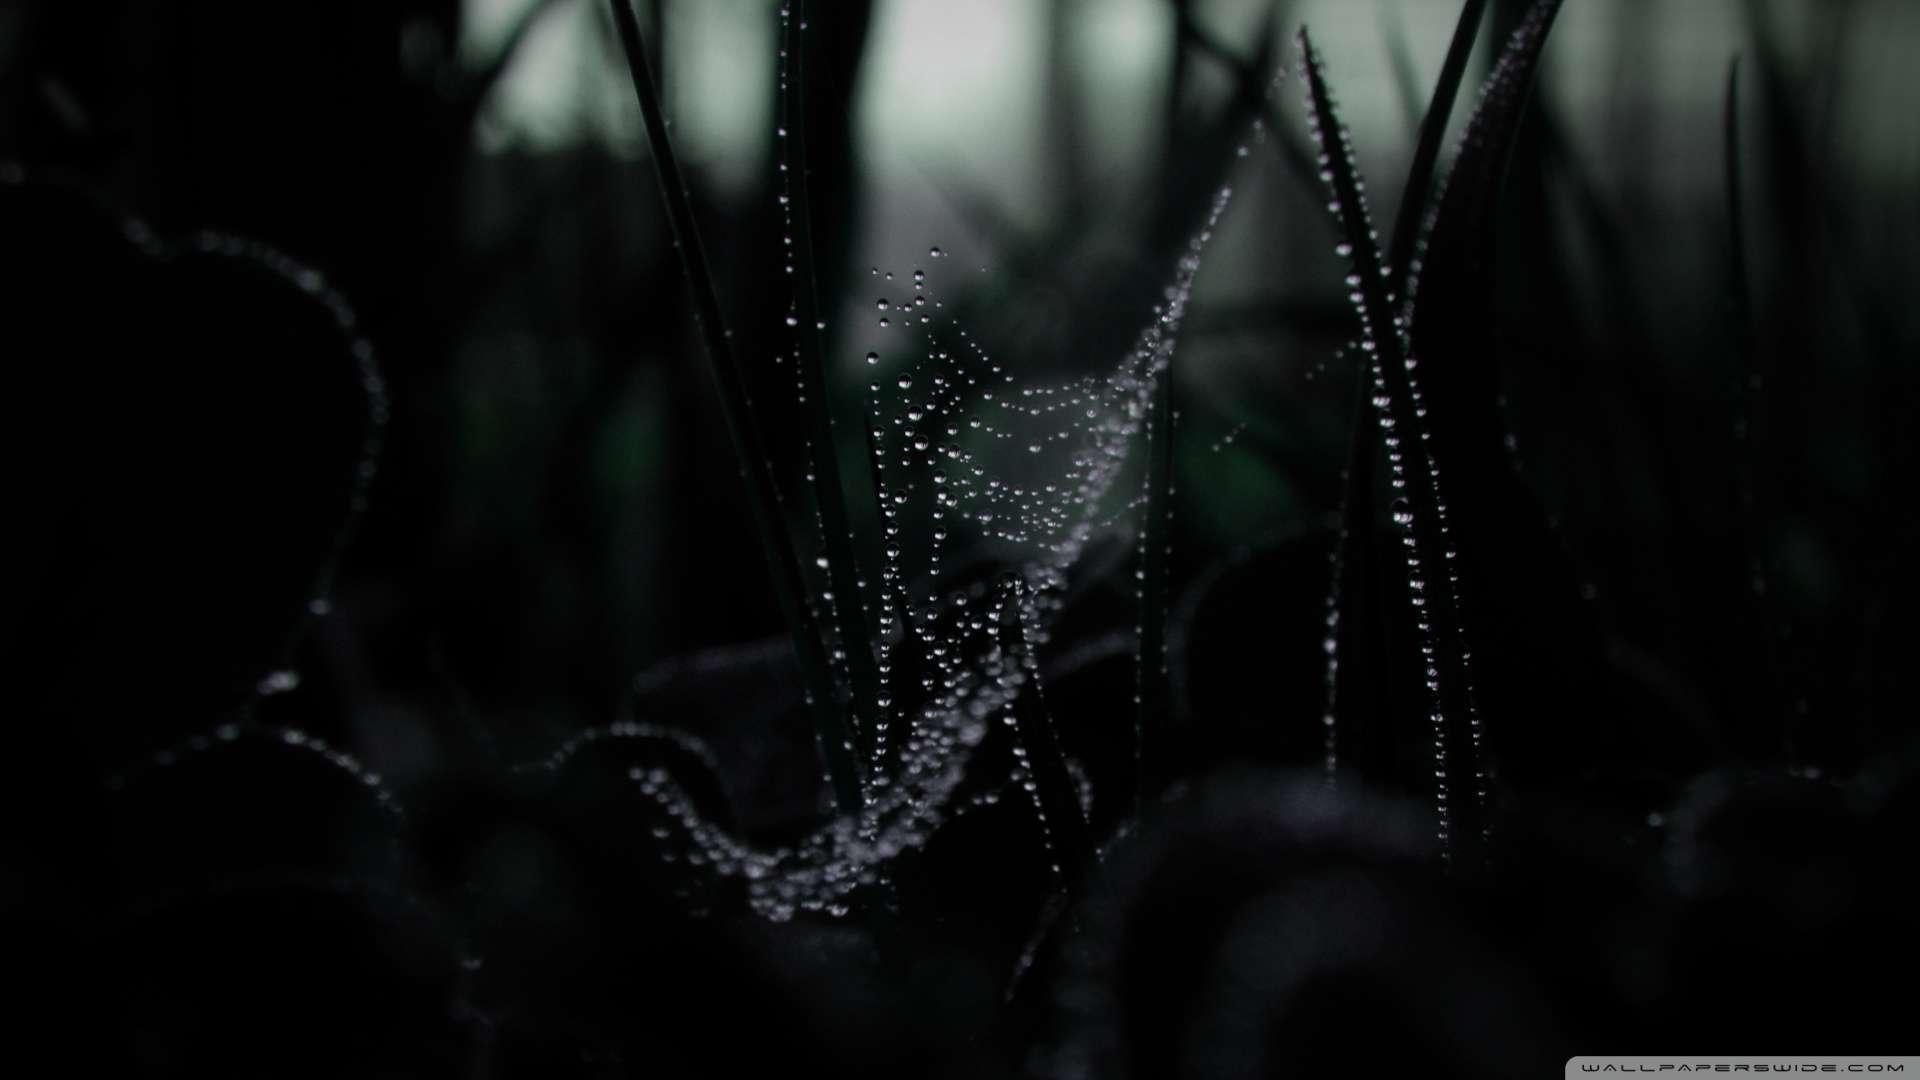 Wallpaper Dew On Spider Web Macro Wallpaper 1080p HD Upload at 1920x1080